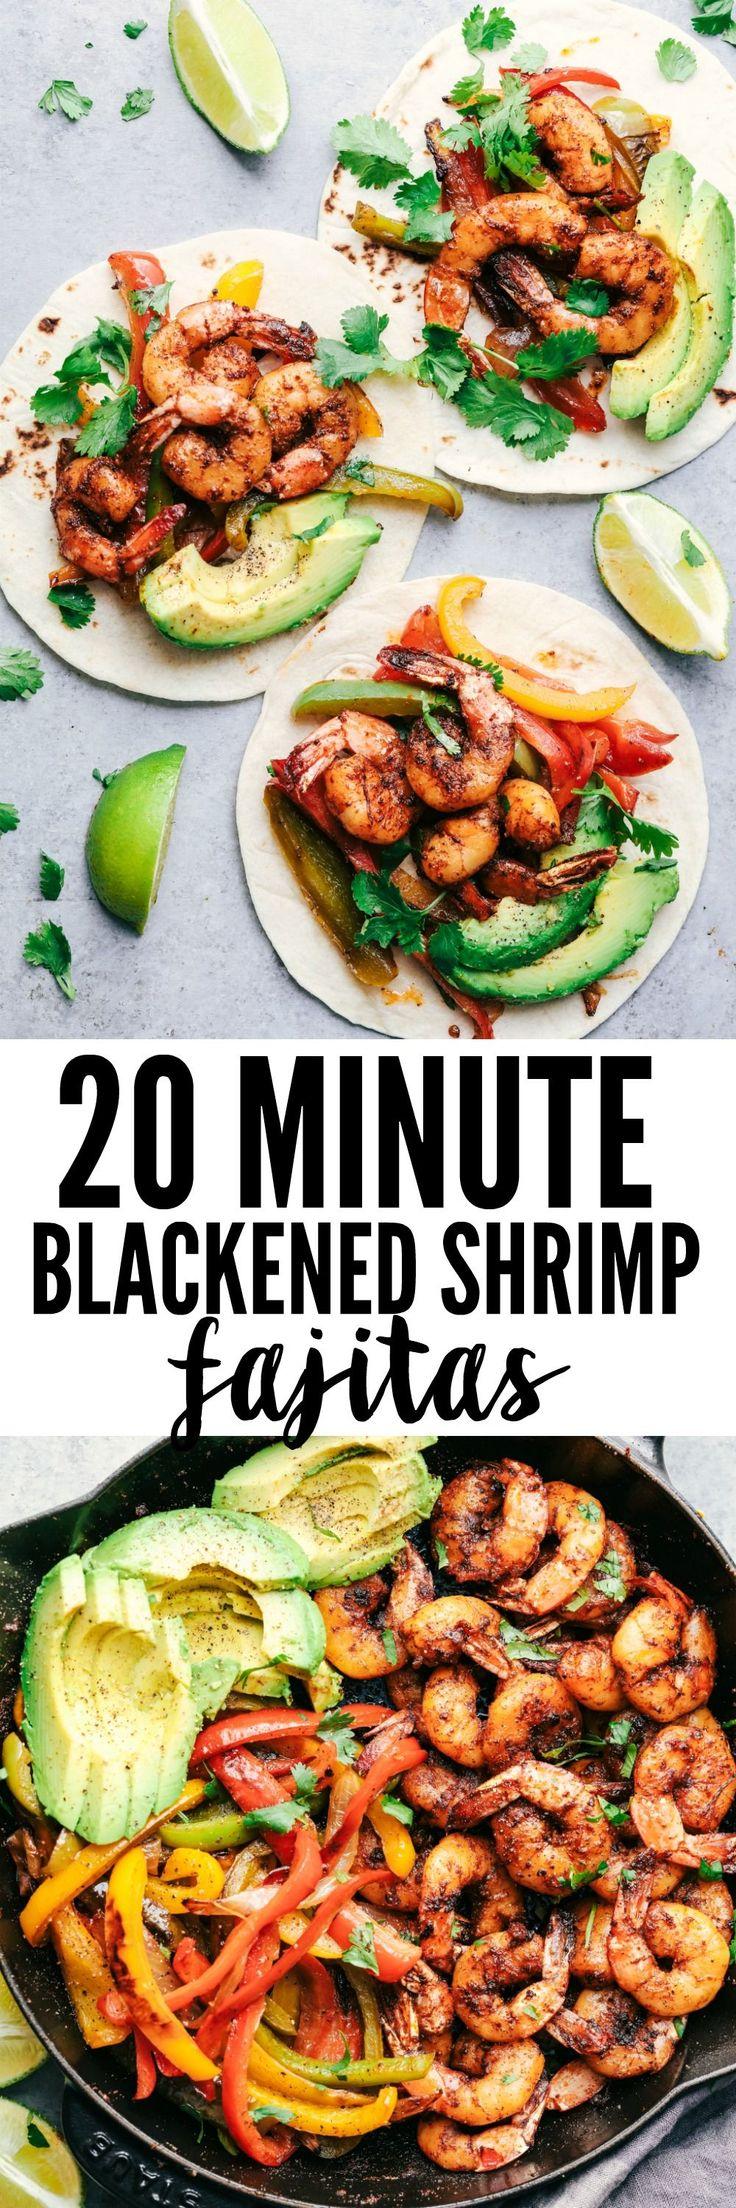 20 Minute Skillet Blackened Shrimp Fajitas